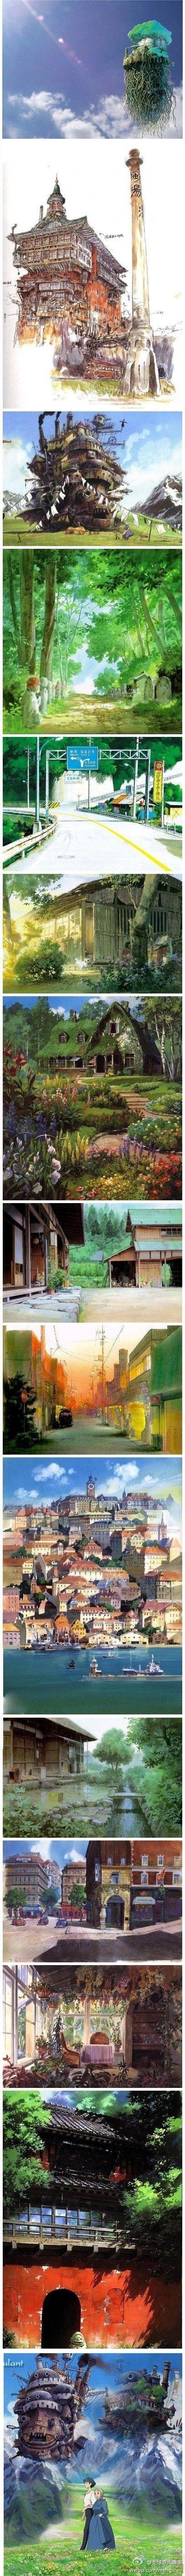 scenery in Hayao Miyazaki films. The illustration in these is wonderful-so much atmosphere! | Studio ghibli filme, Miyazaki, Animationsstudio